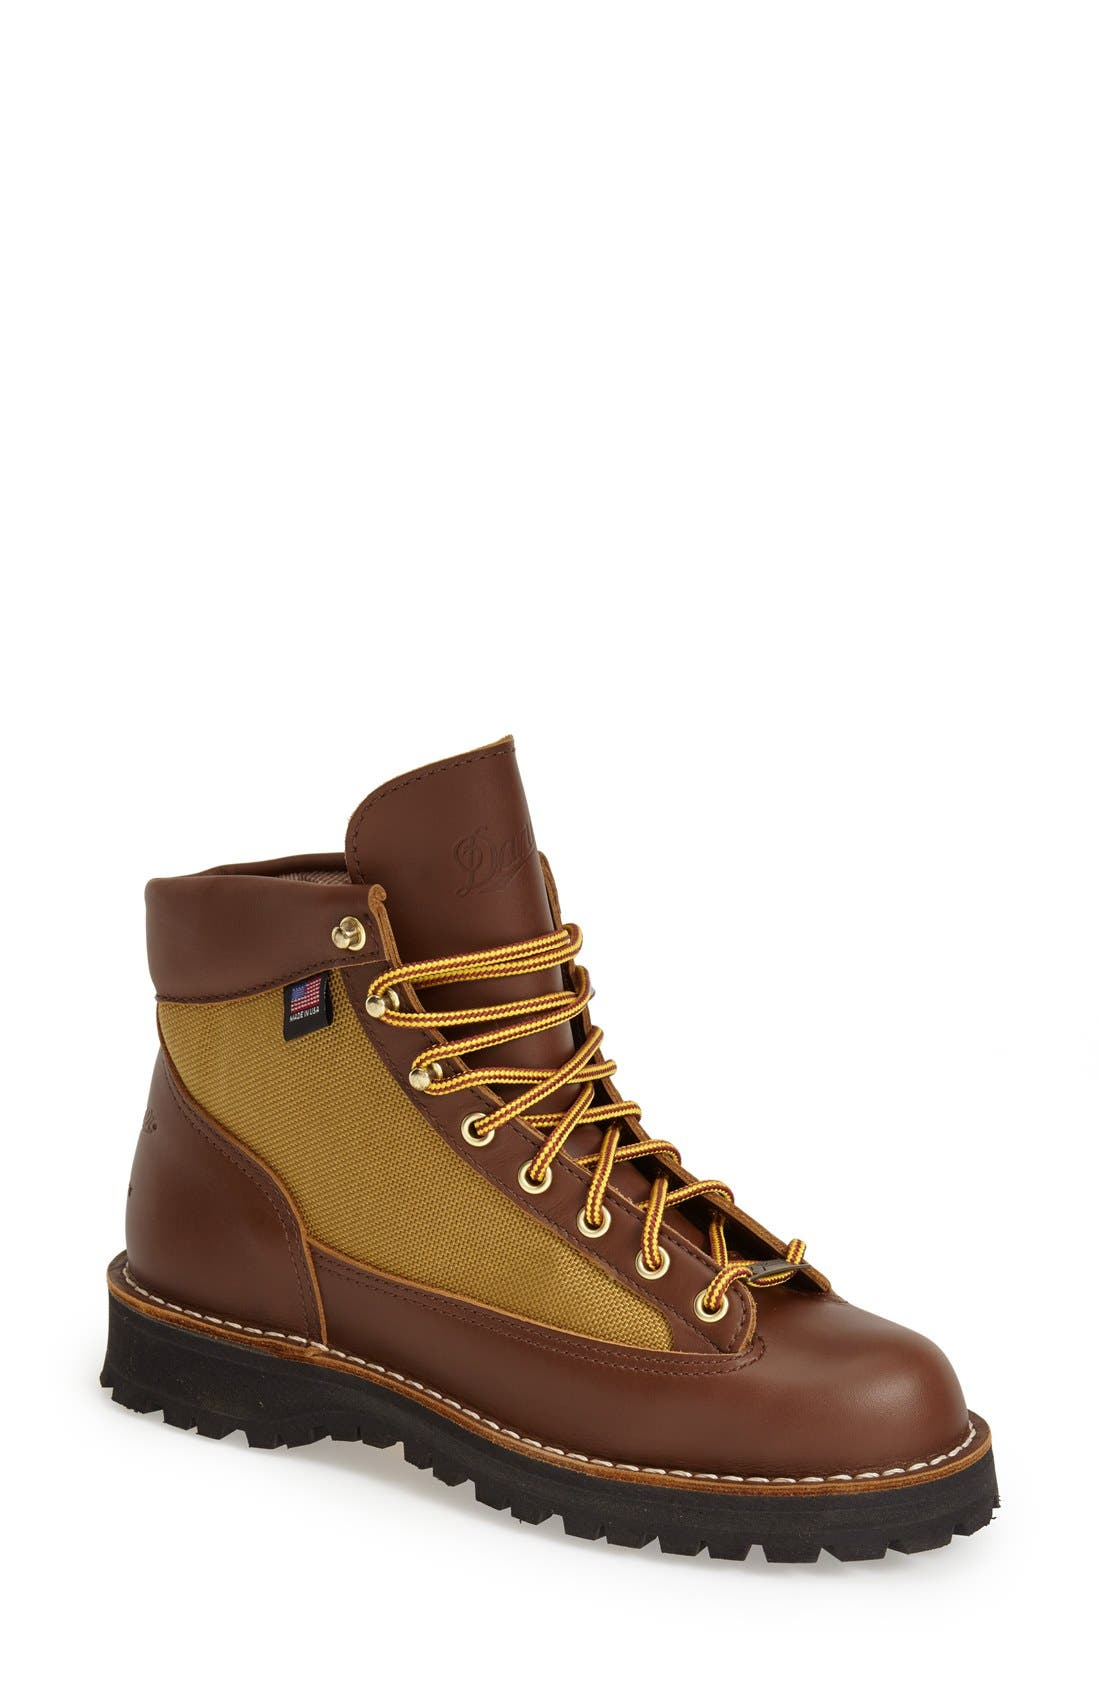 'Danner Light' Hiking Boot, Main, color, 200